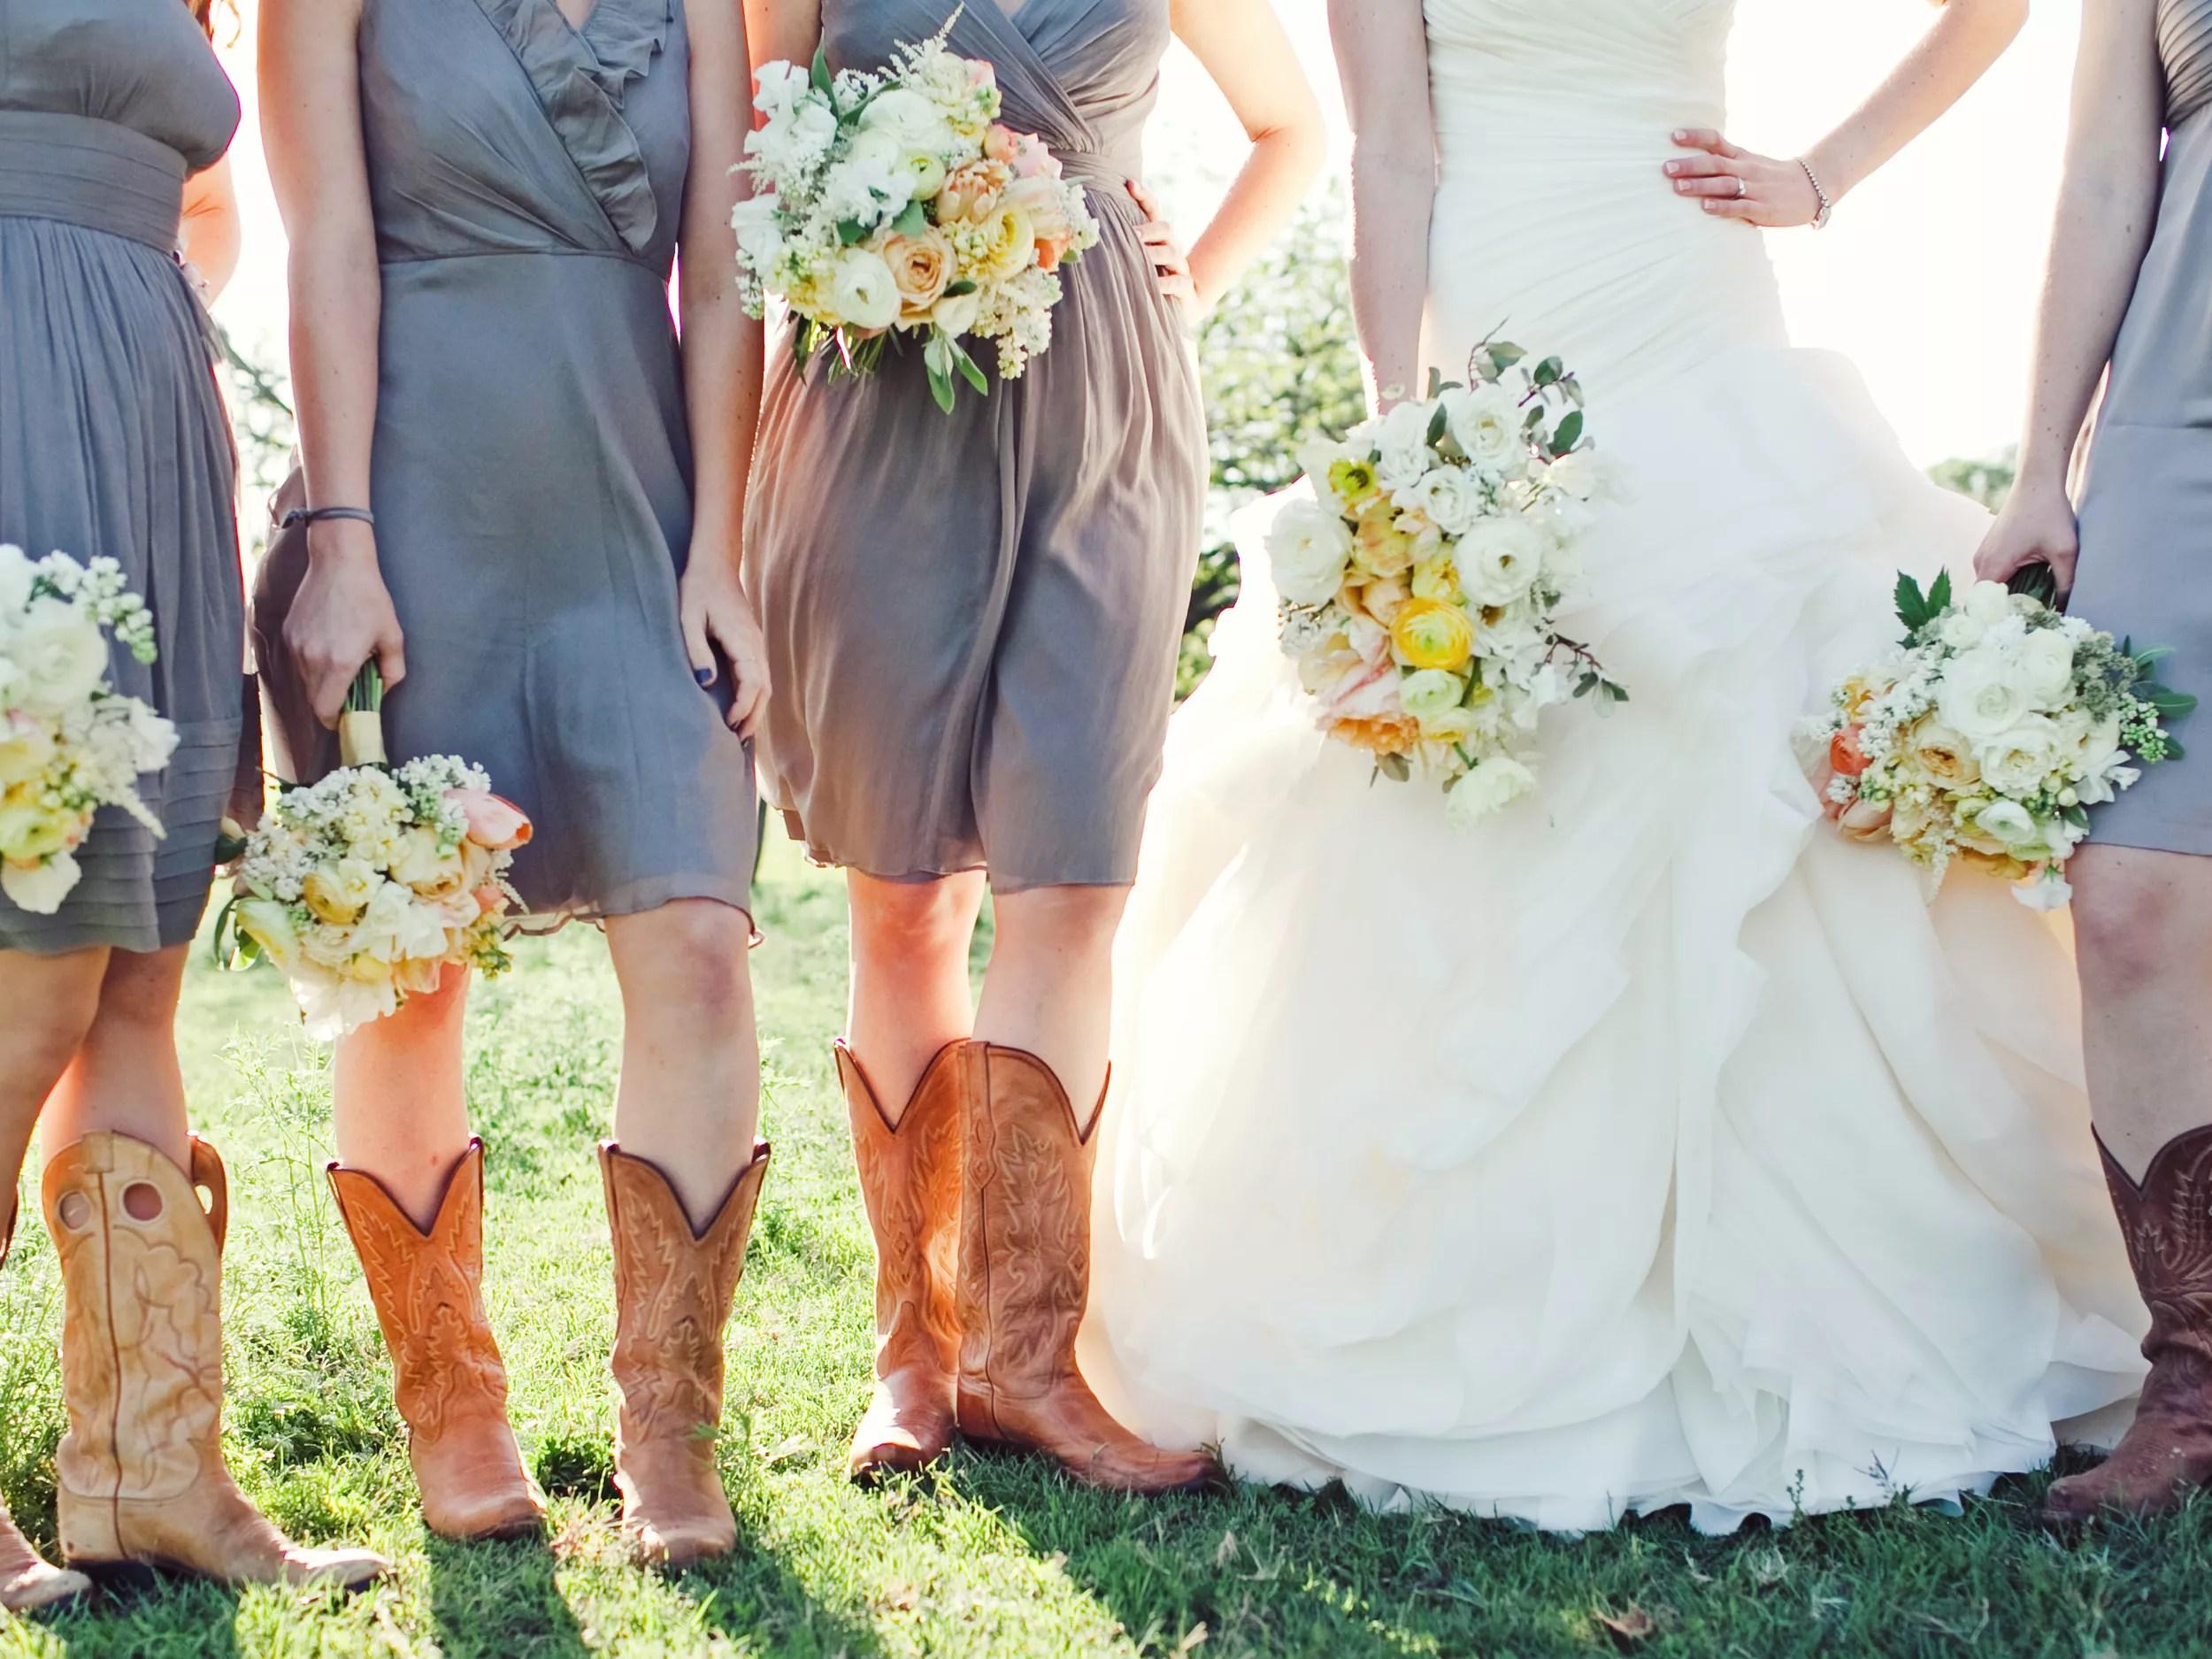 Best Wedding Reception Songs 2017